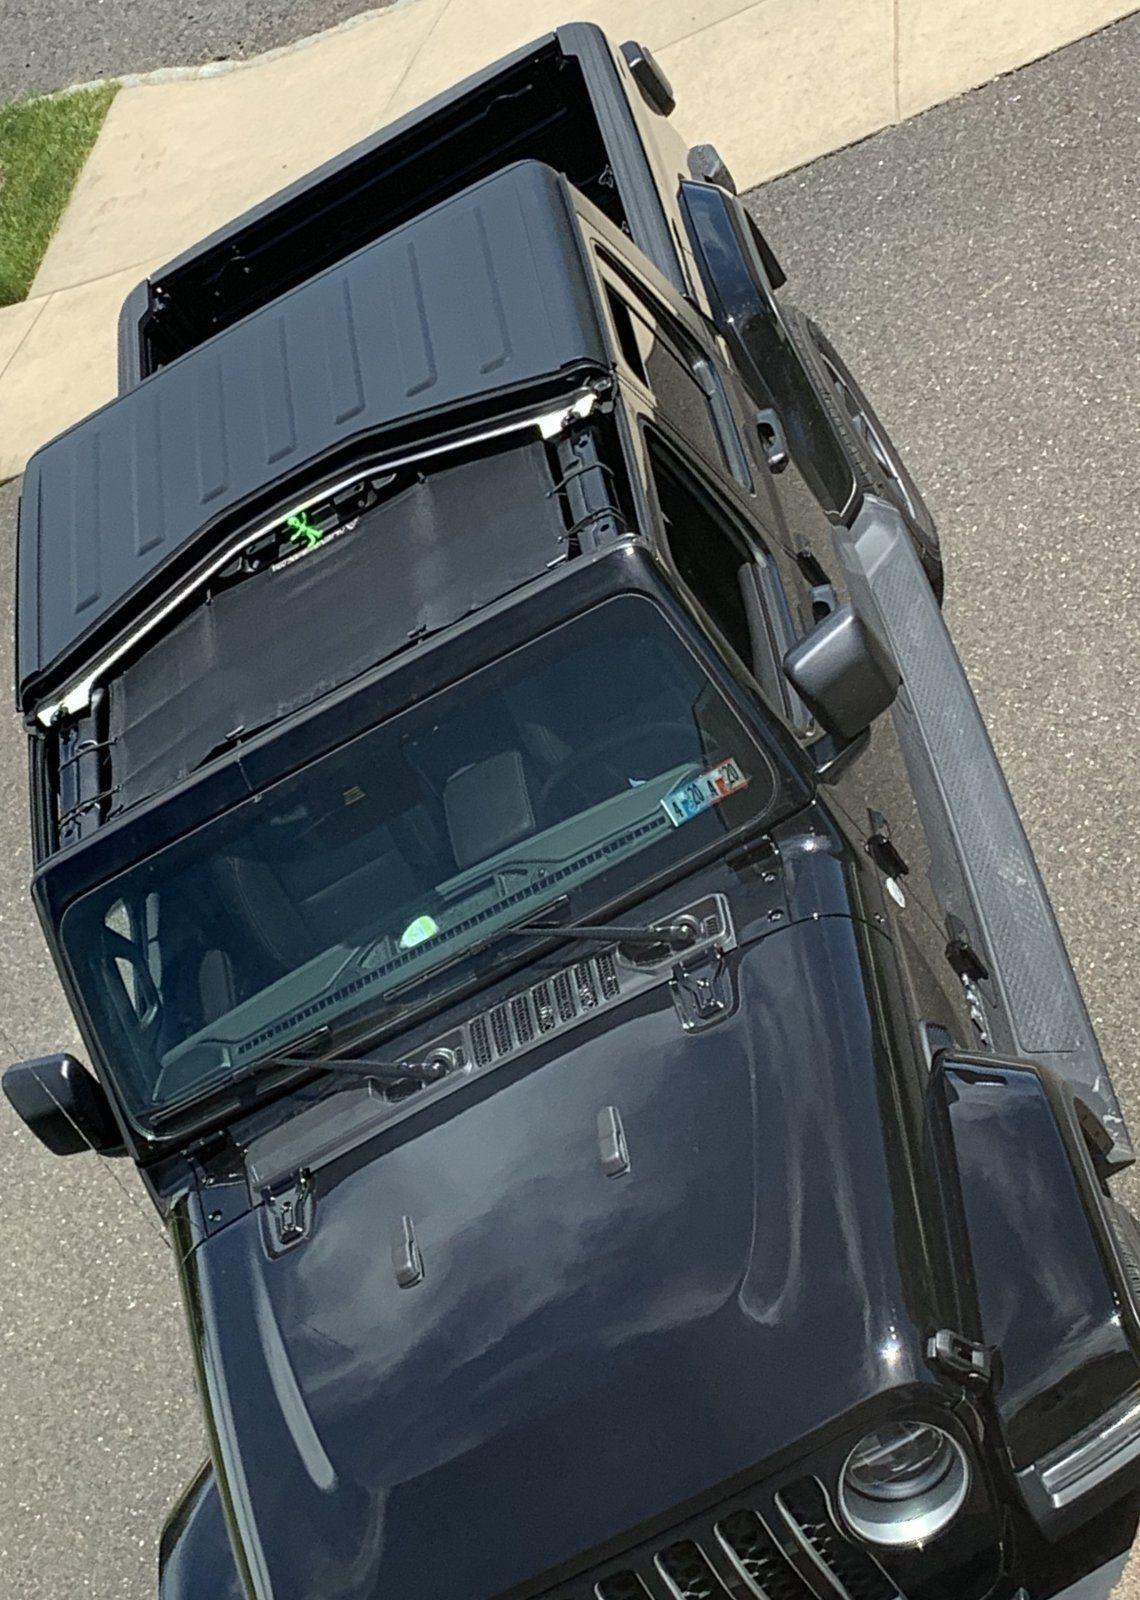 10 Jeep Gladiator Pick Up Truck Ideas Jeep Gladiator Jeep Gladiator